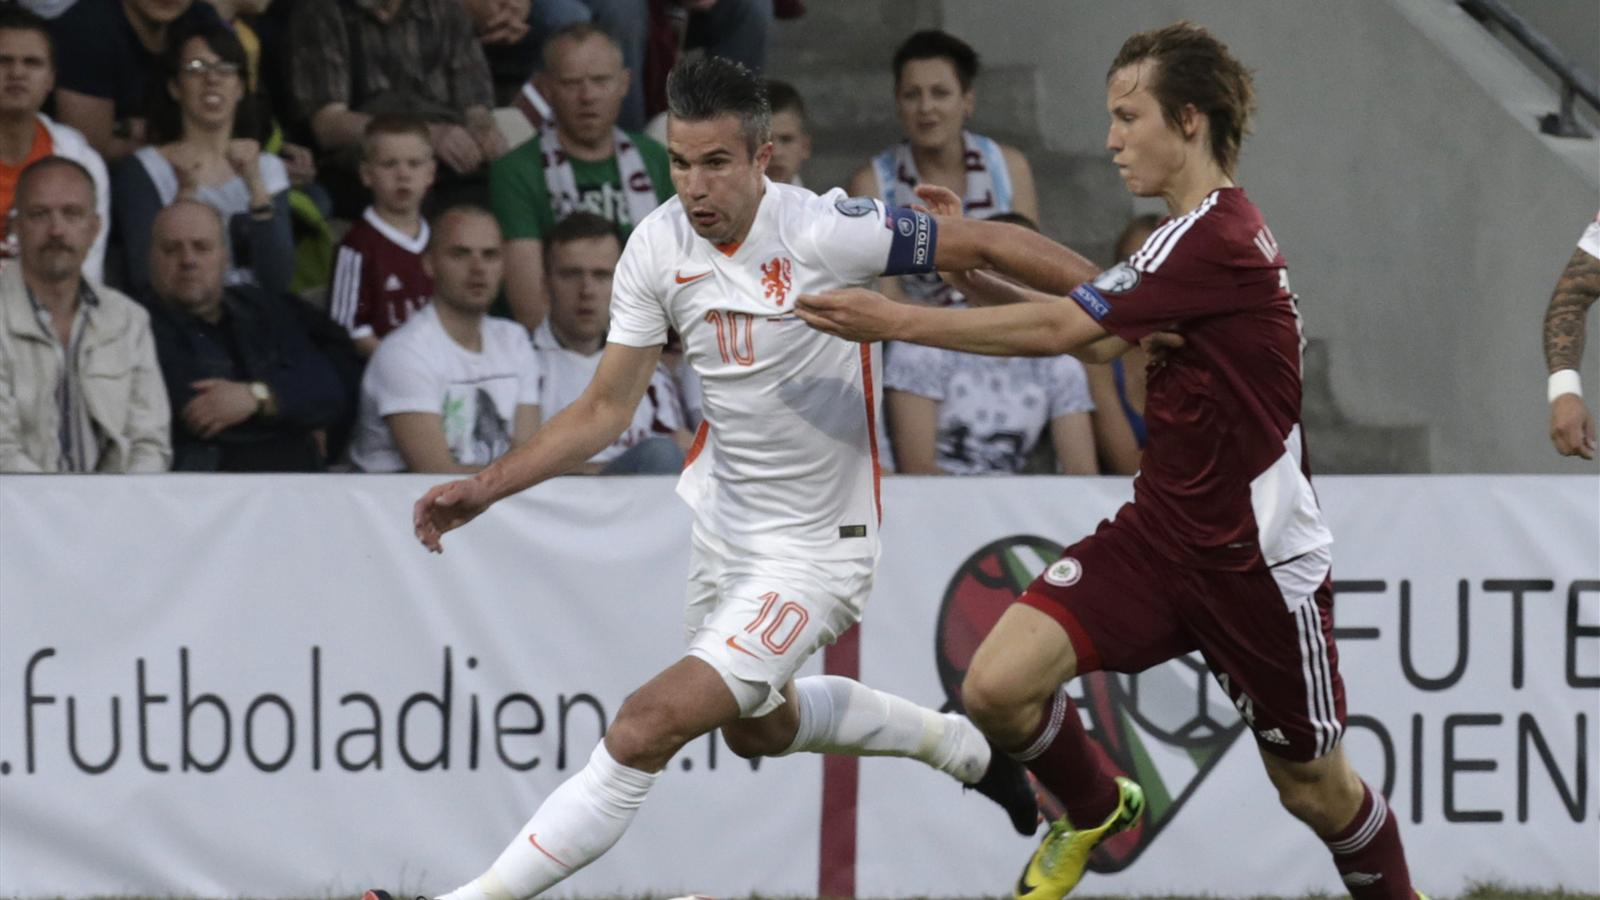 Netherlands' Van Persie fights for ball with Latvia's Ikaunieks